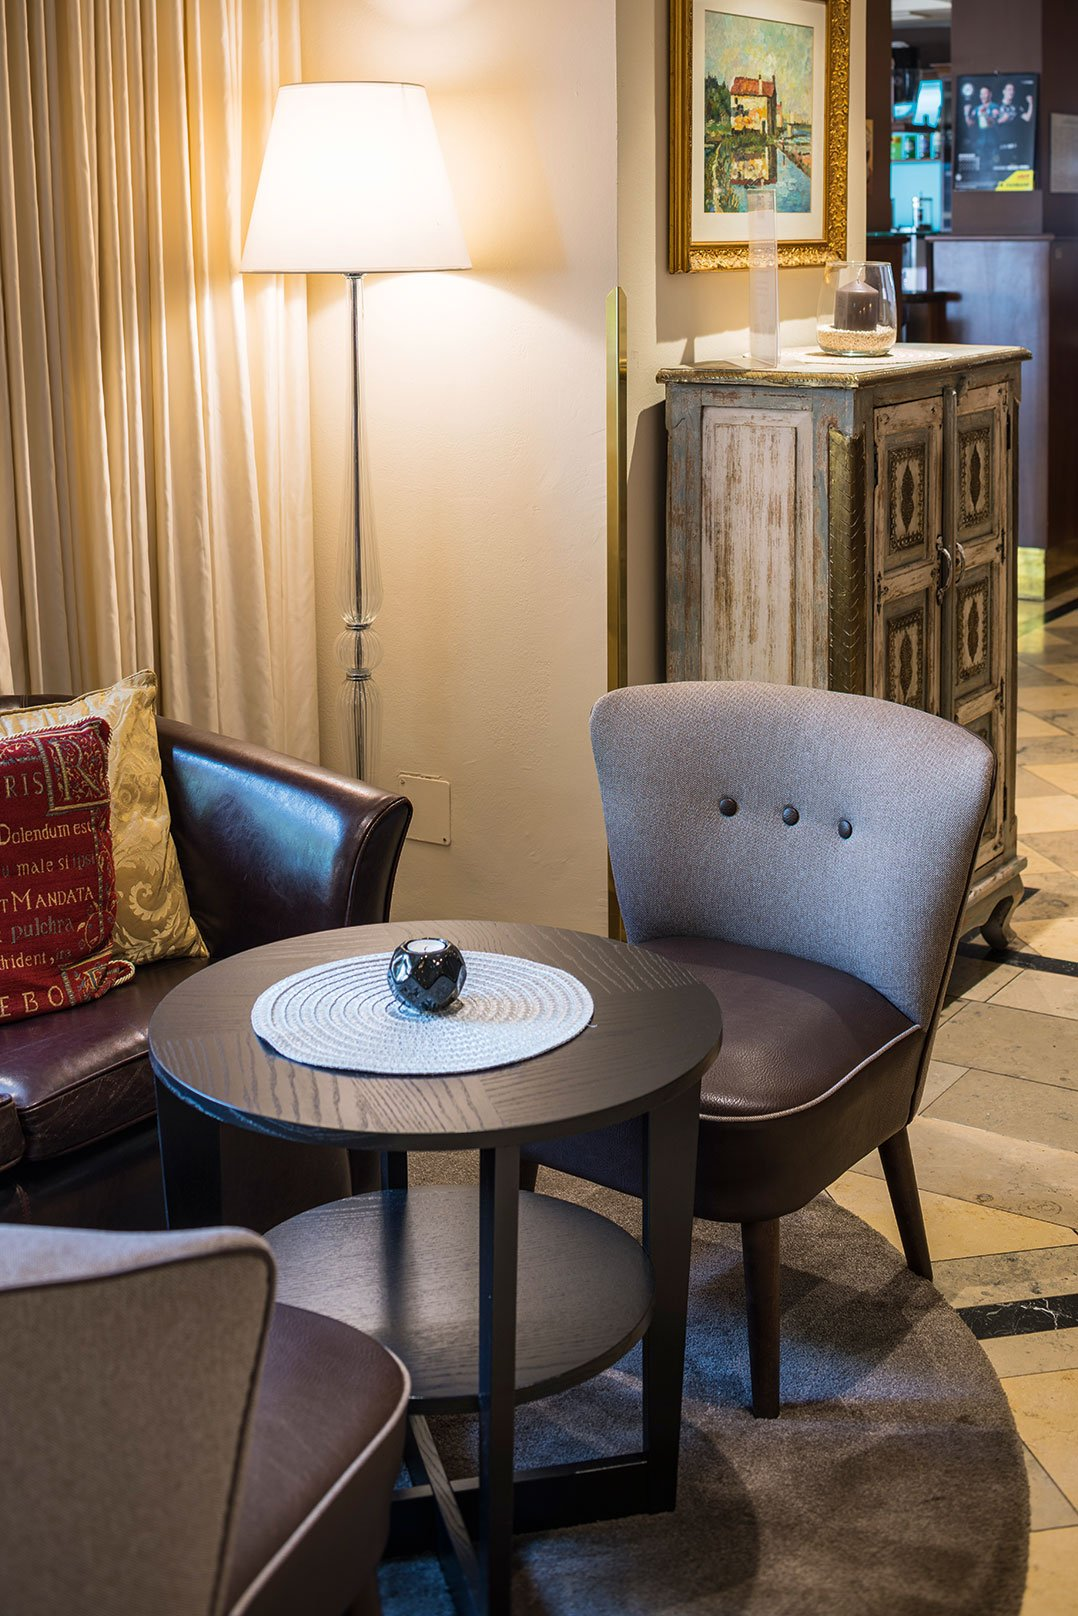 Indoor Hotel Furniture